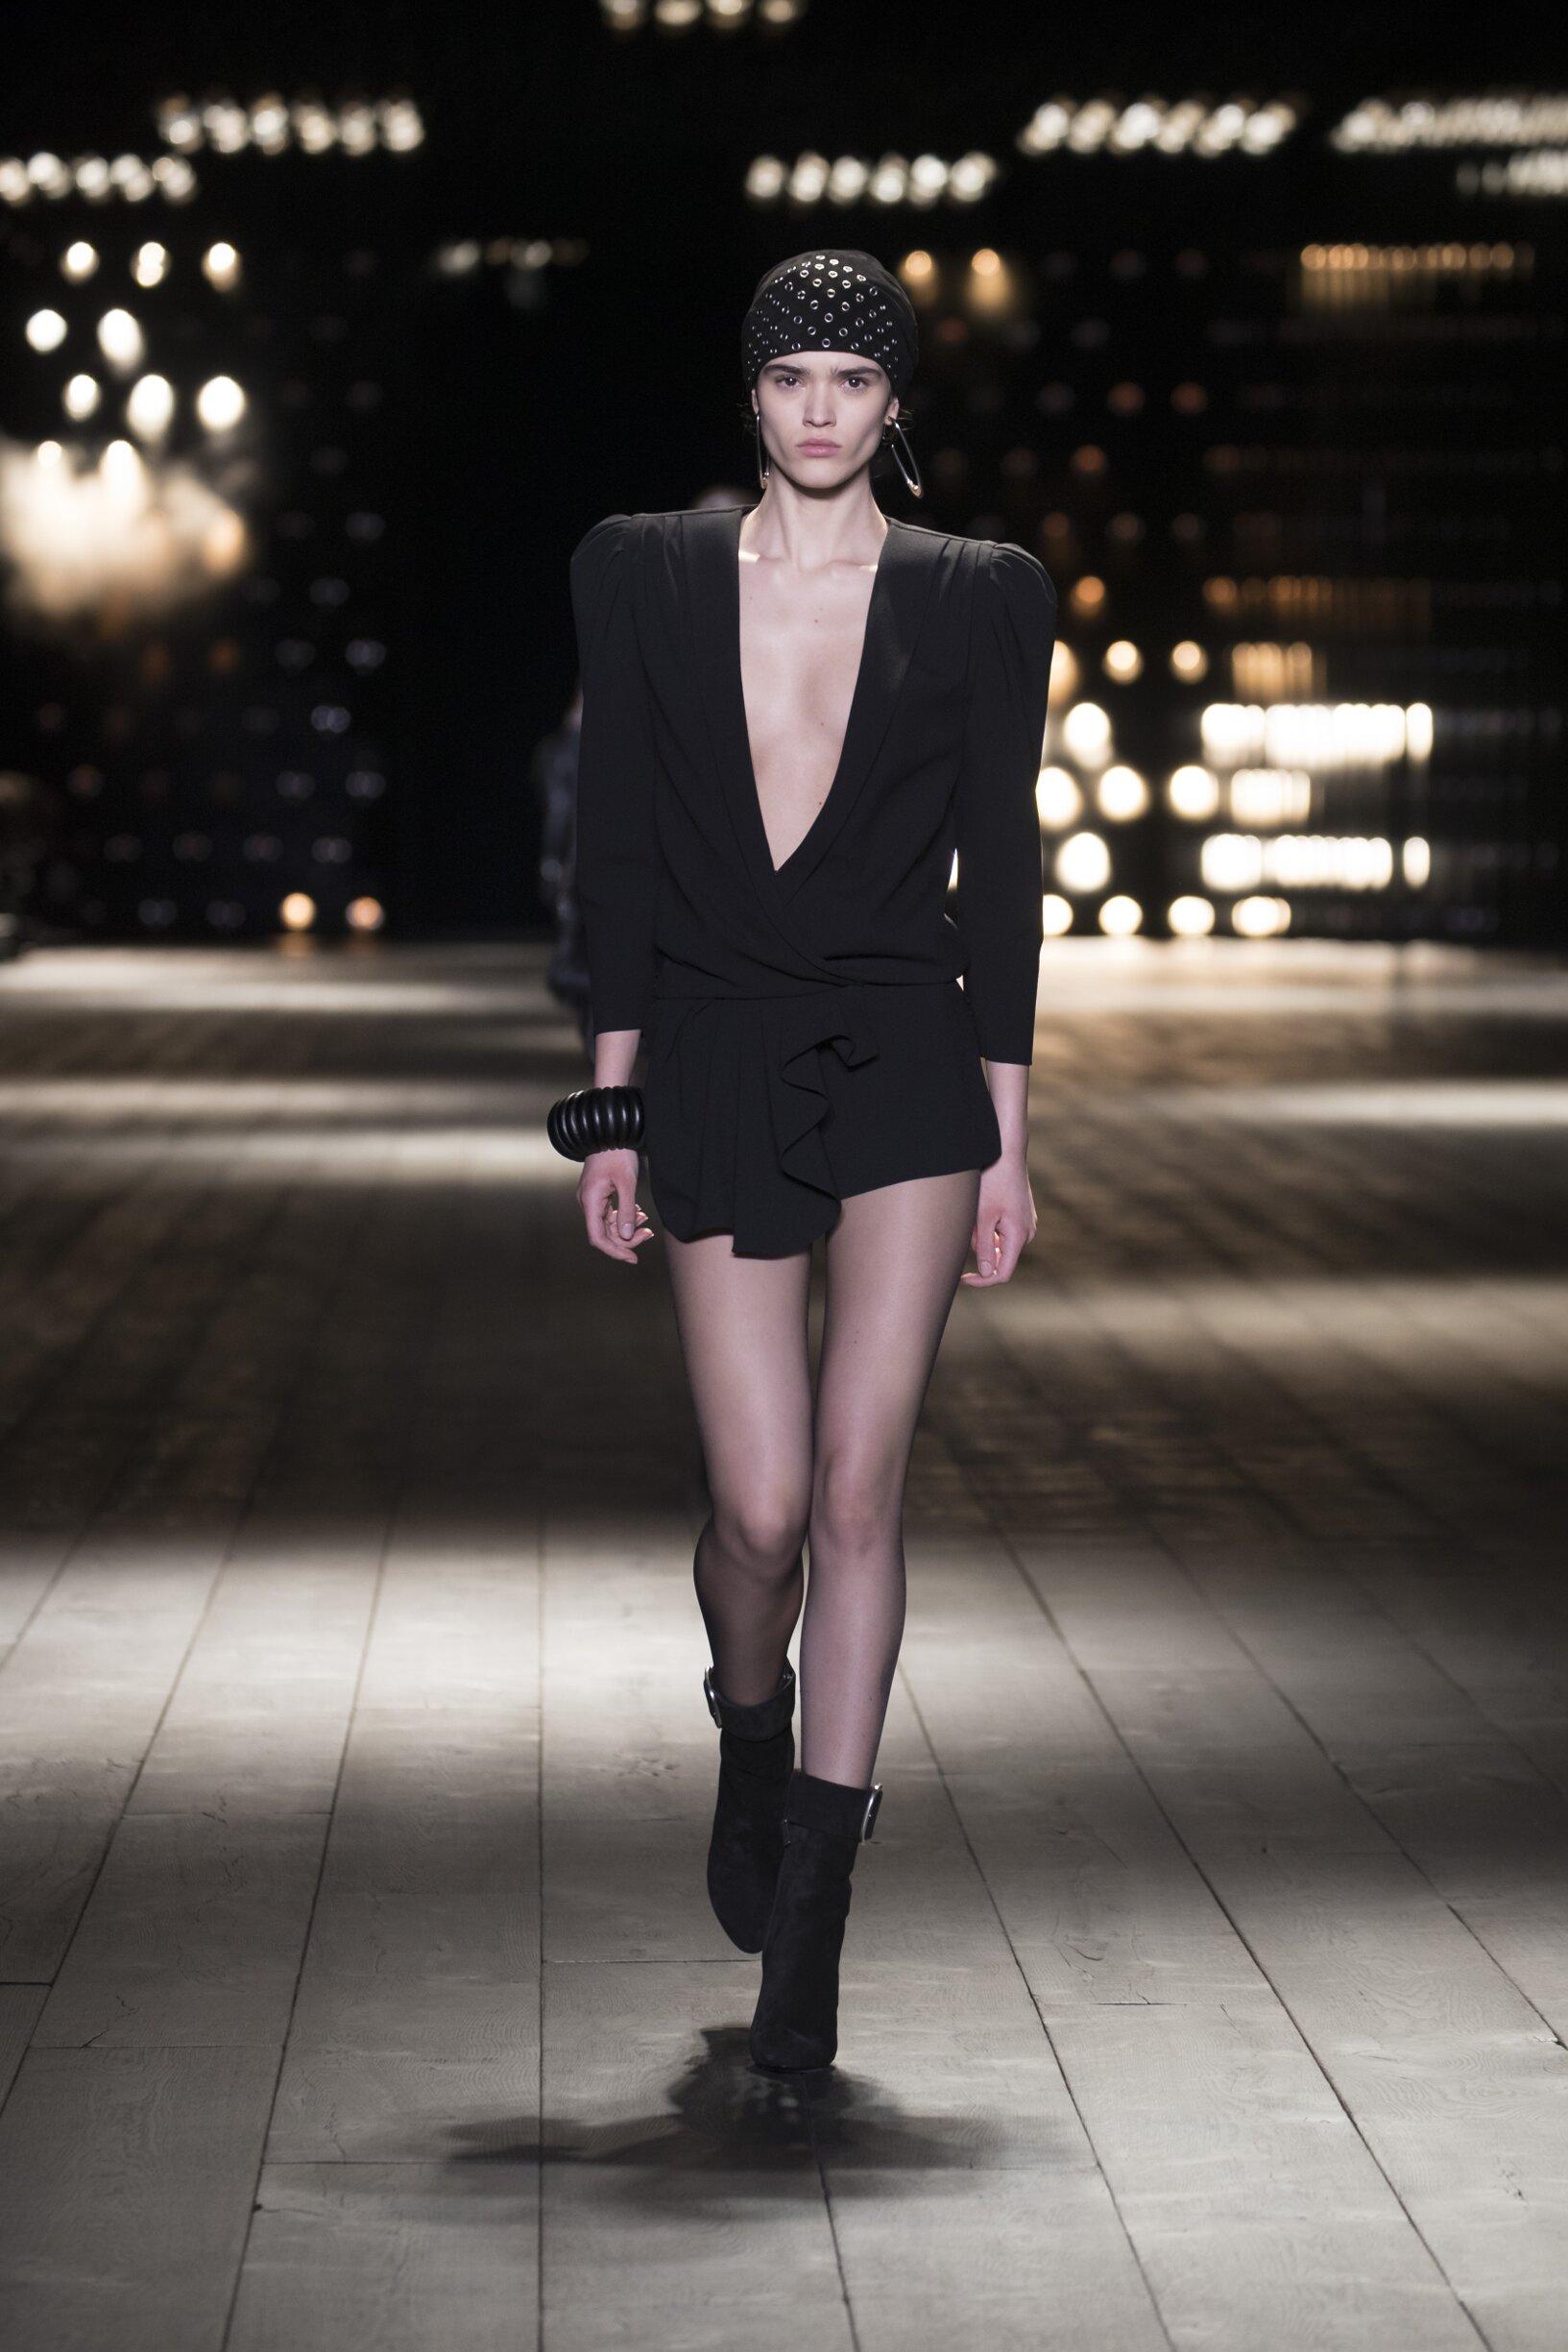 Runway Saint Laurent Fall Winter 2018 Women's Collection Paris Fashion Week